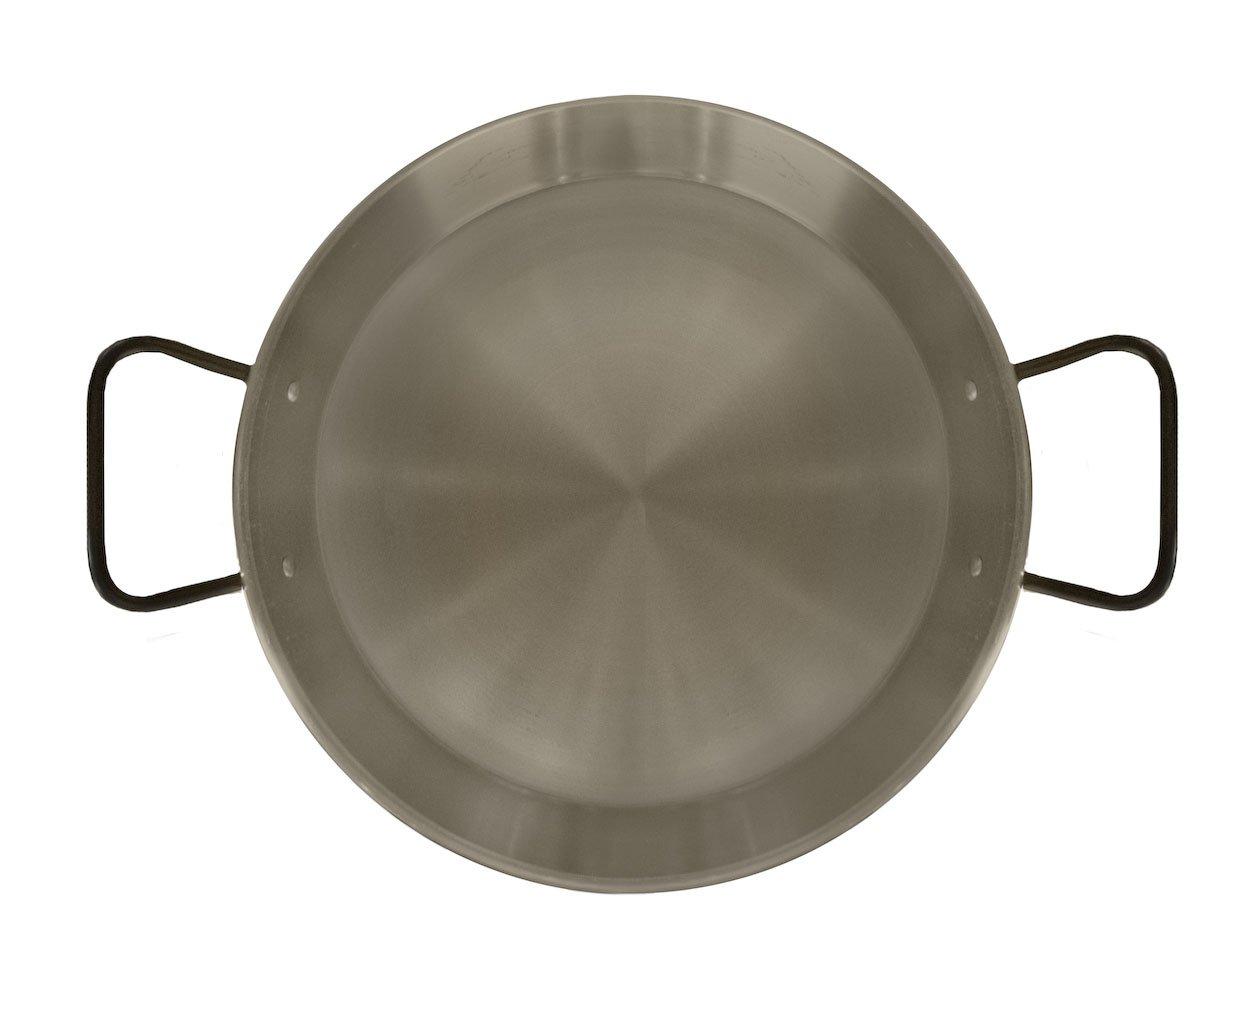 Garcima La Ideal Polished Steel Professional Paella Pan 38cm for Ceramic, Induction & AGA hobs 85138